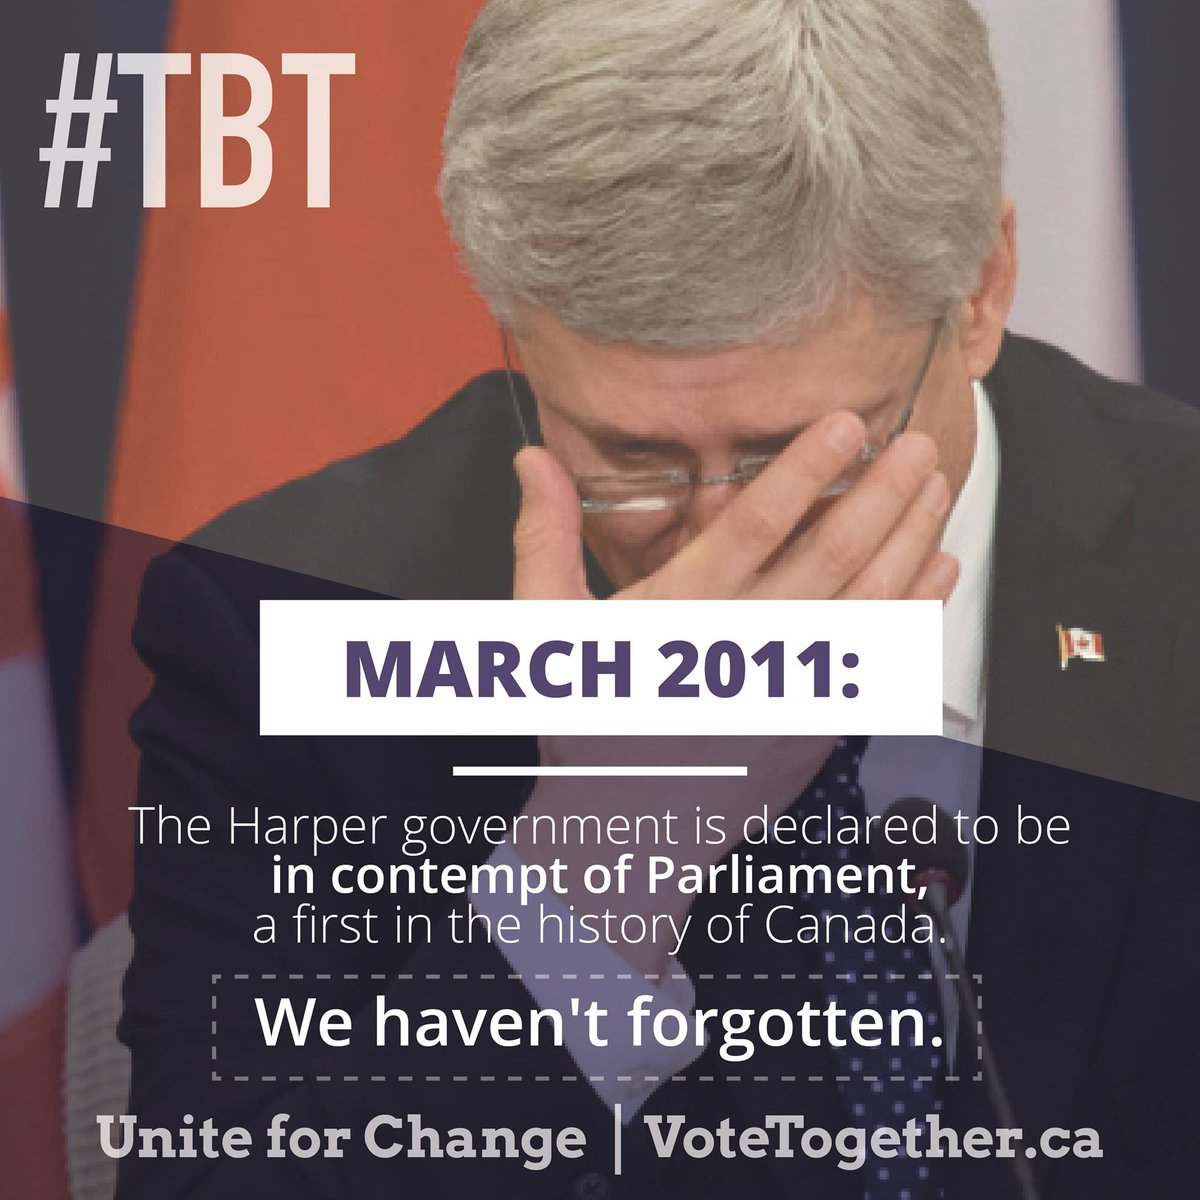 'nuff said. #stopharper #votenation #cdnpoli http://t.co/hRa8TPDC9f